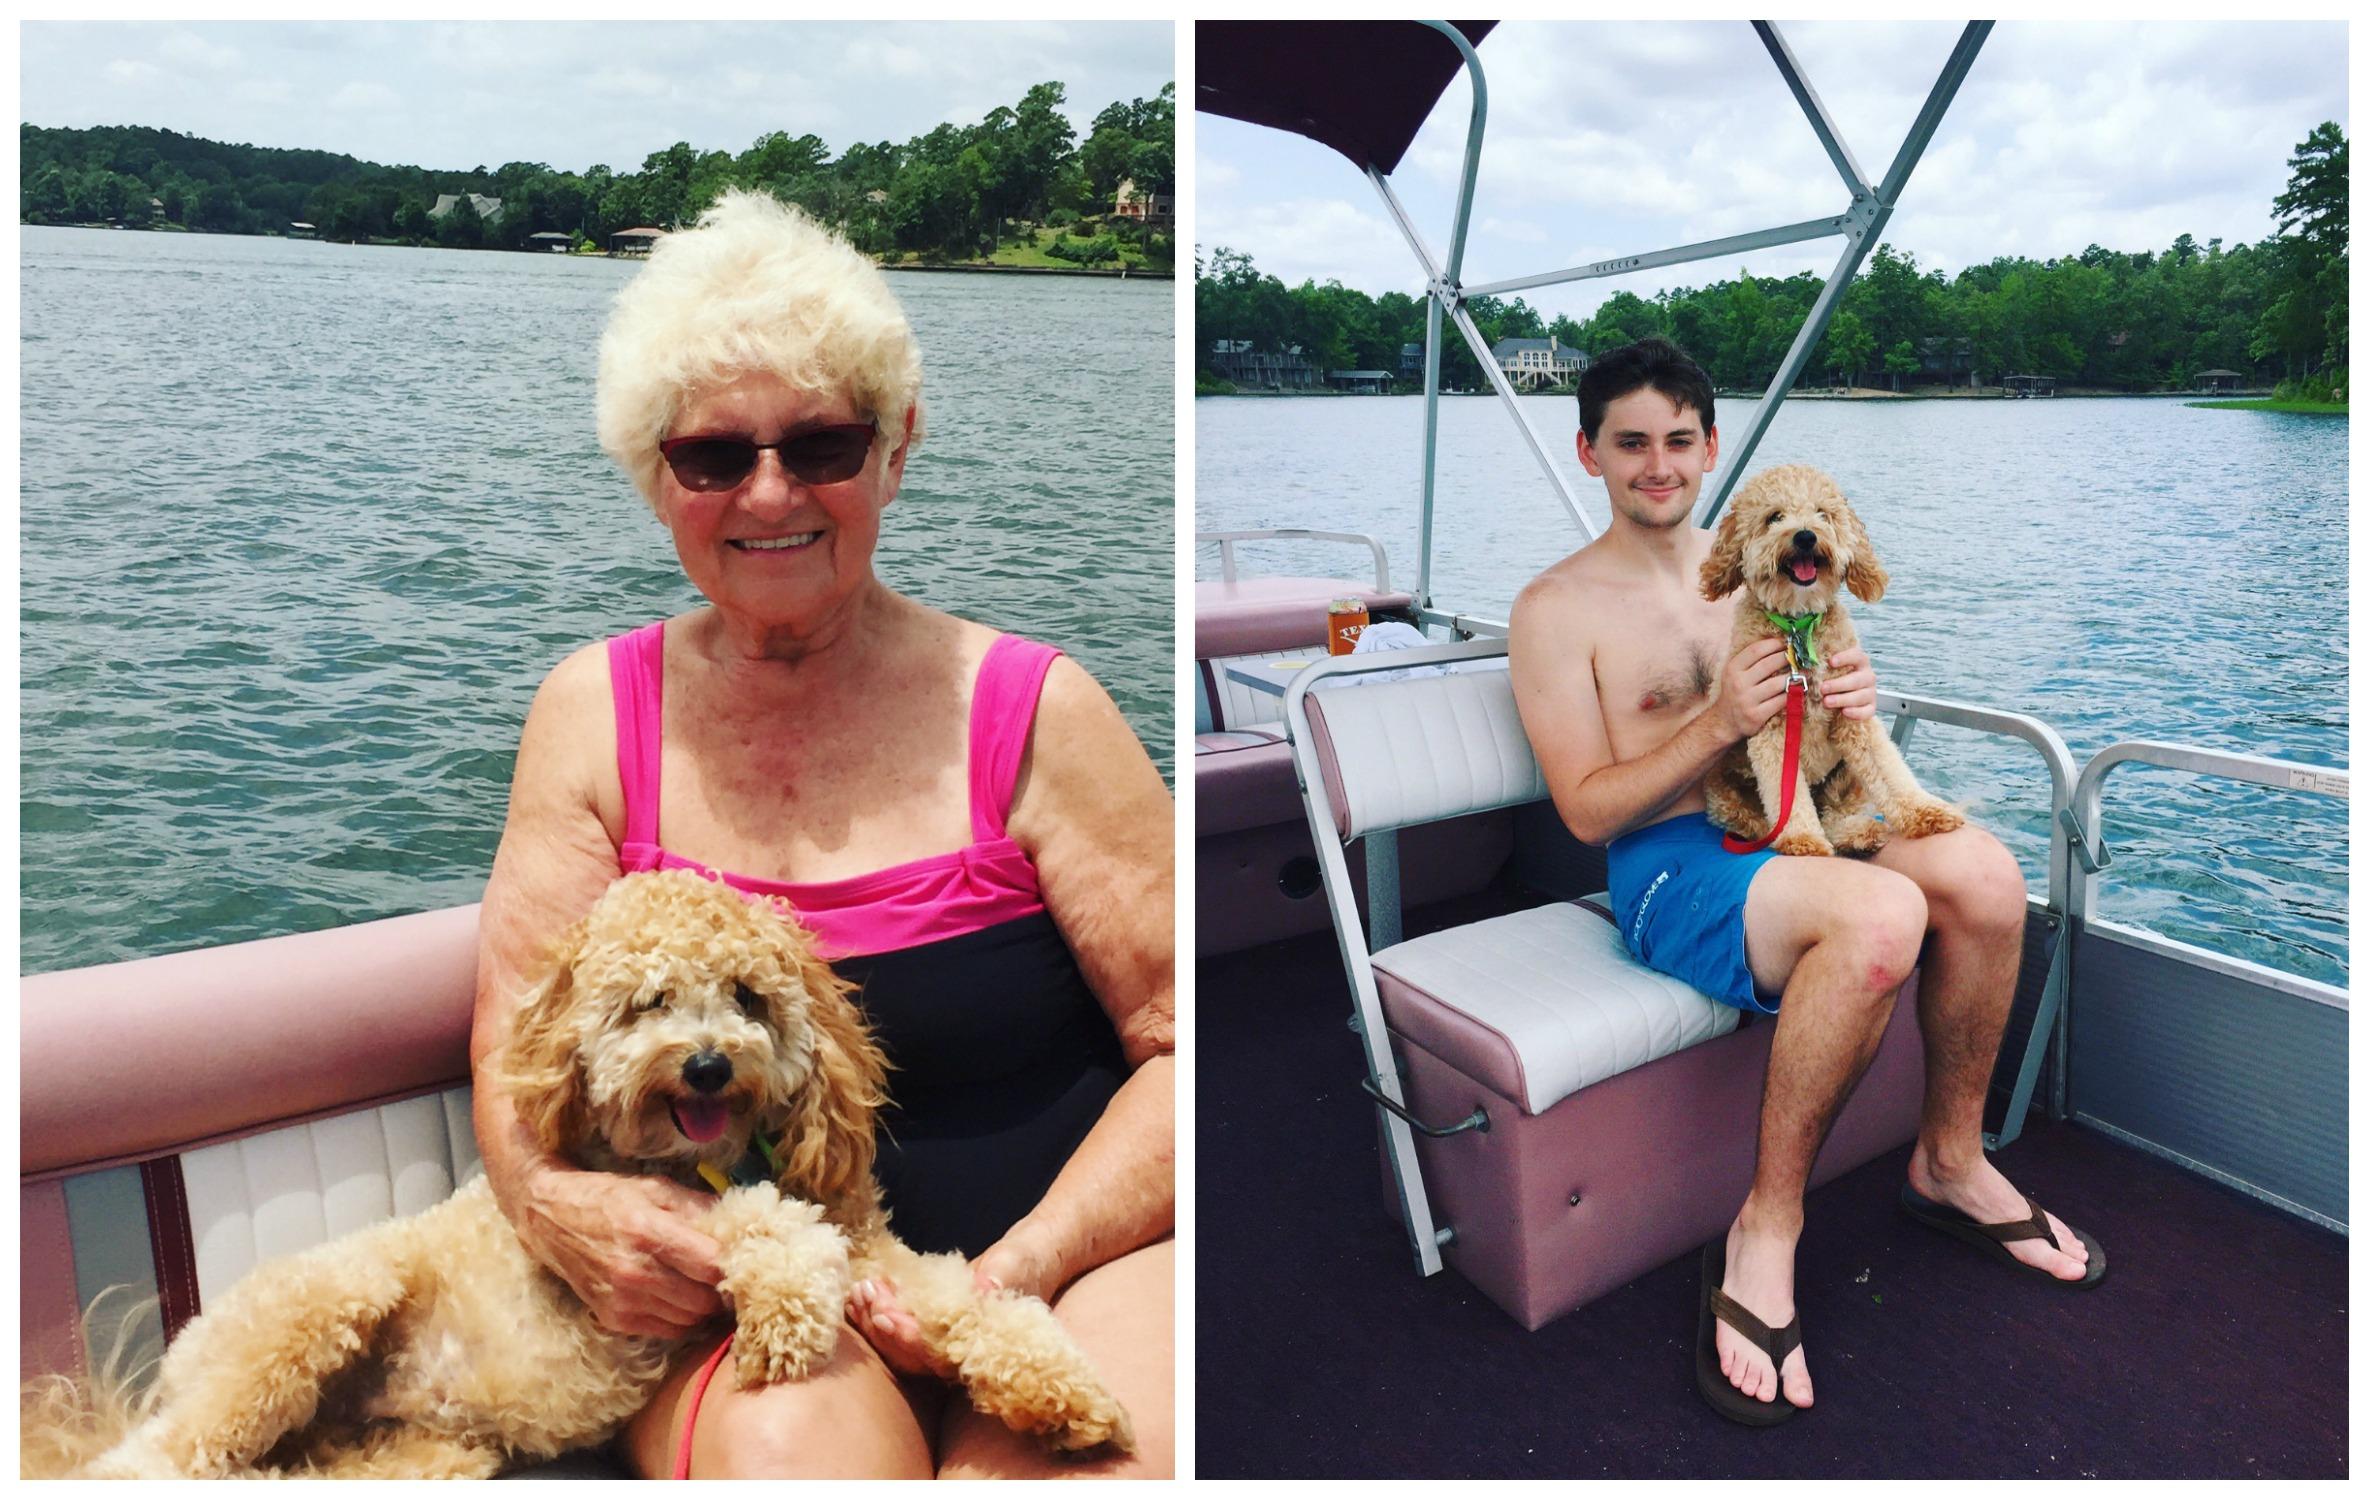 Shiner the Boat Dog